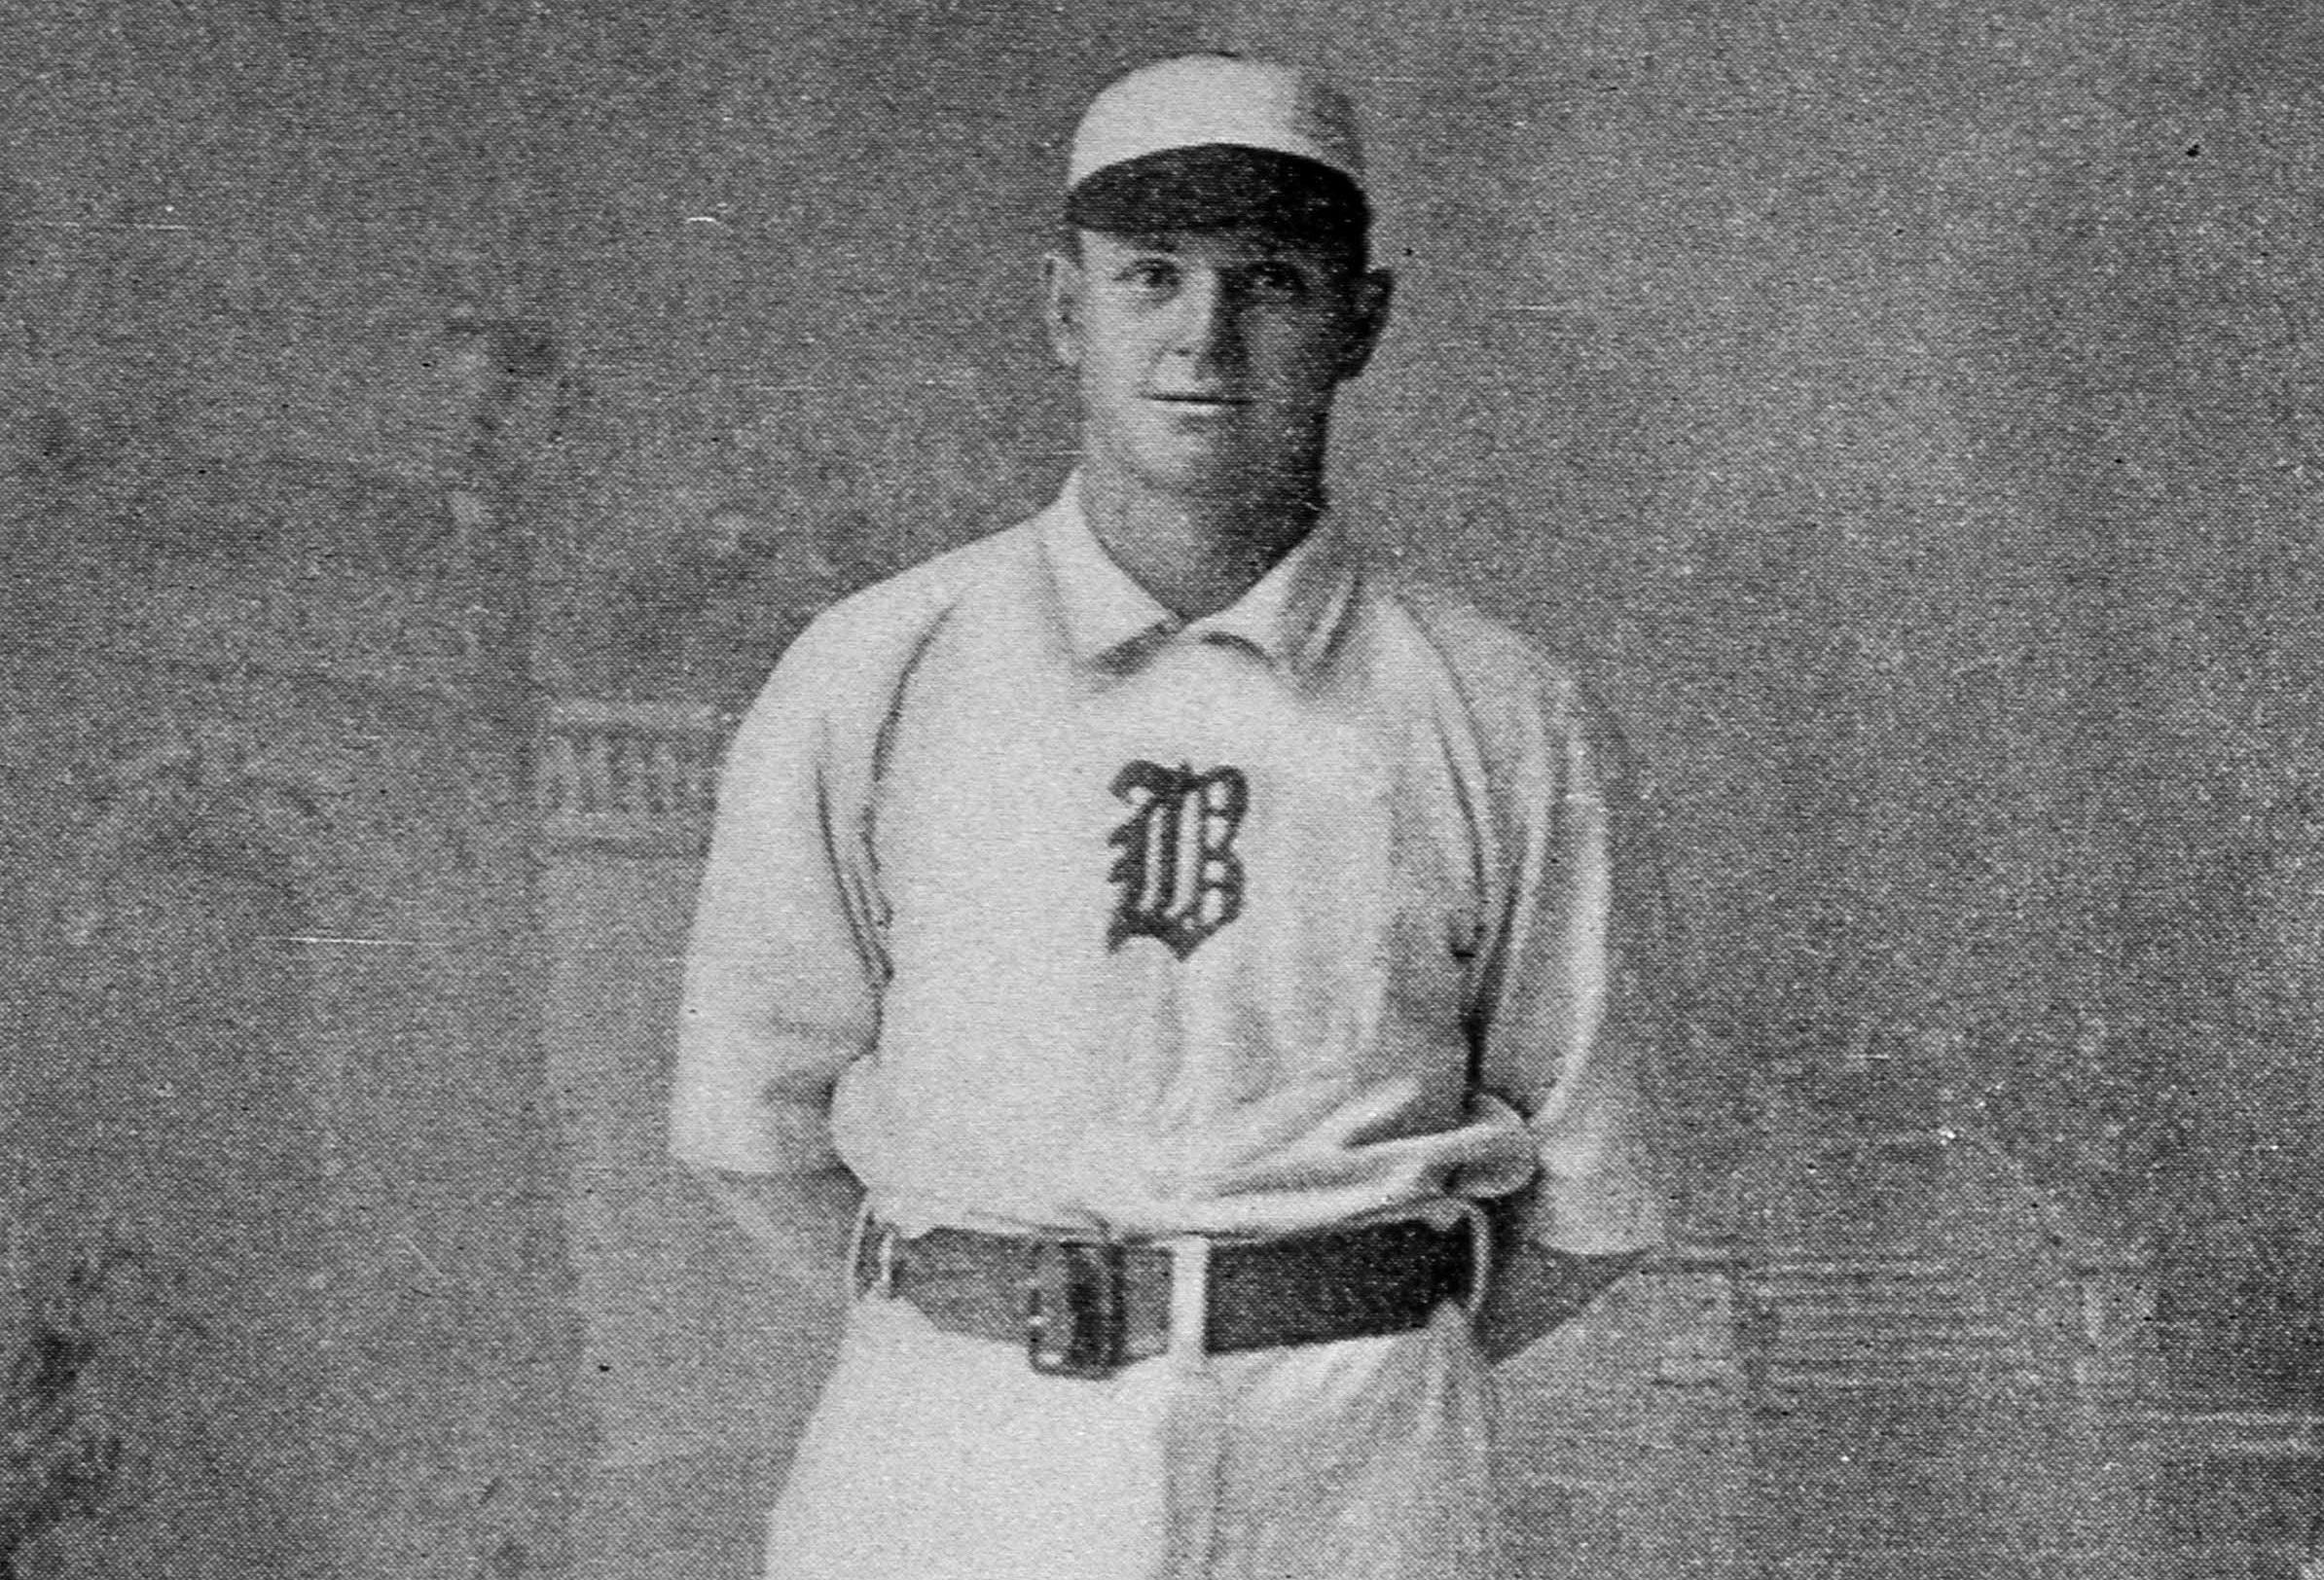 19th century baseball player Billy Hamilton